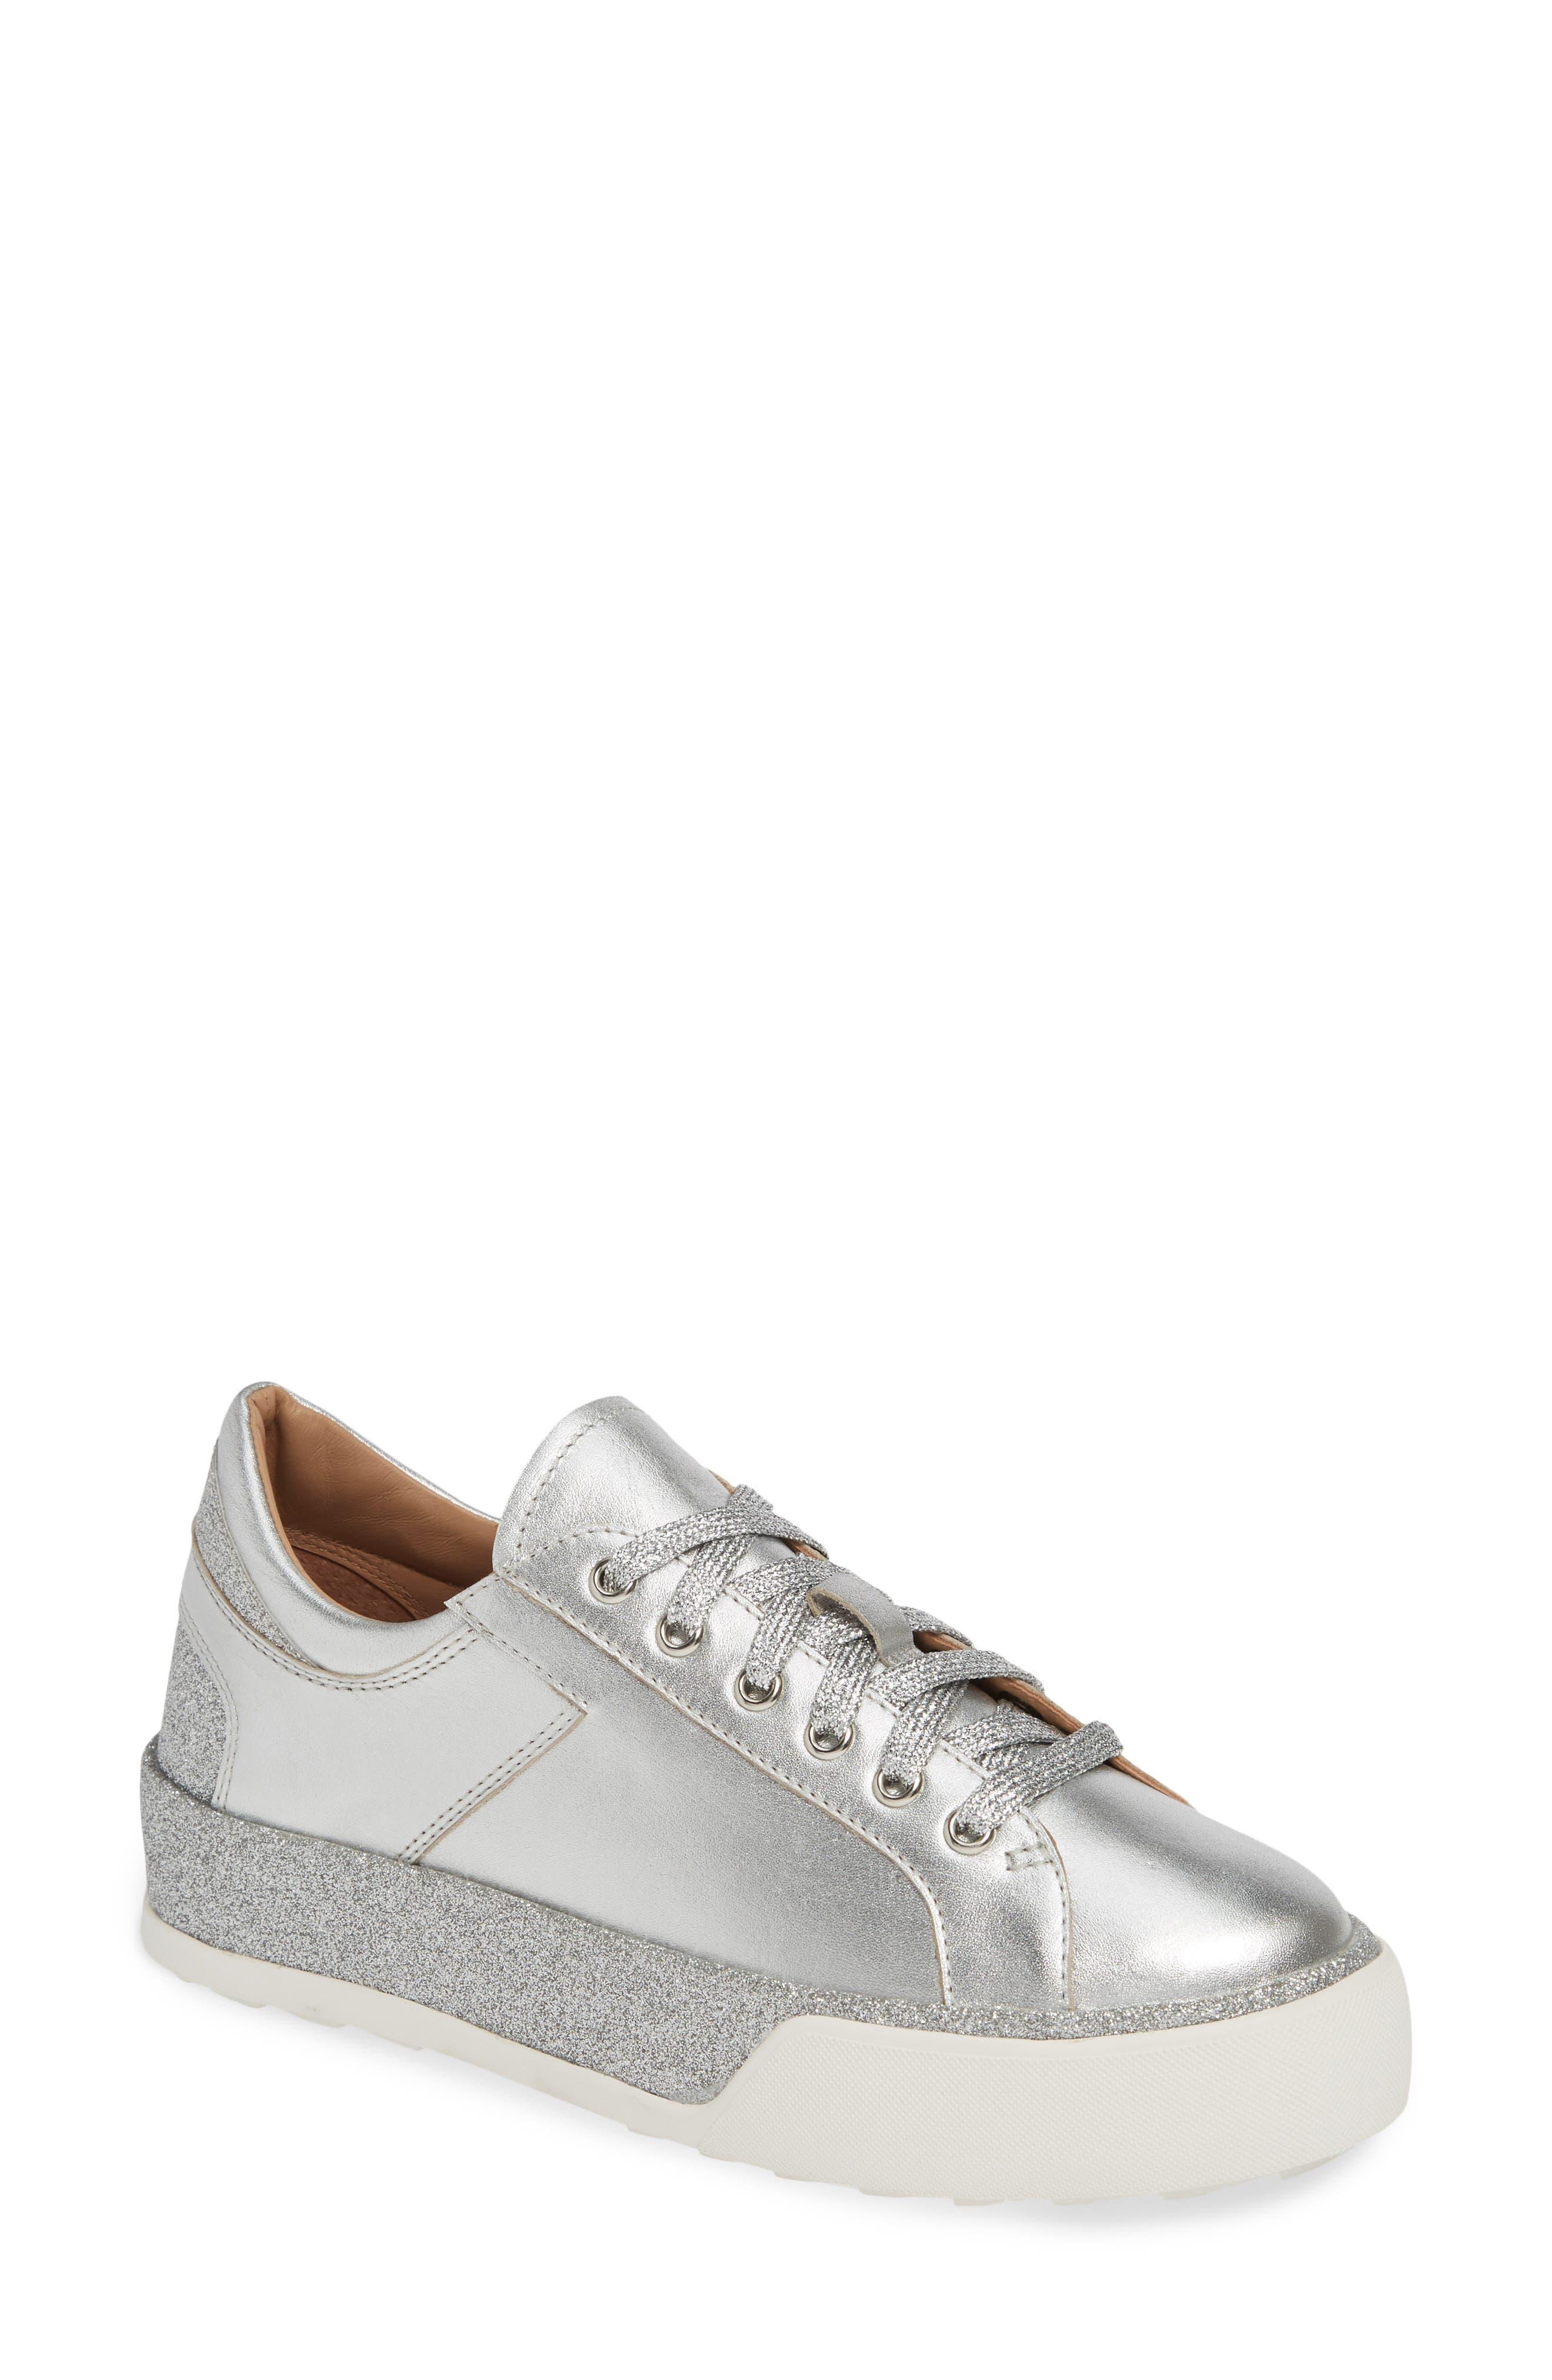 Linea Paolo | Katz Platform Sneaker